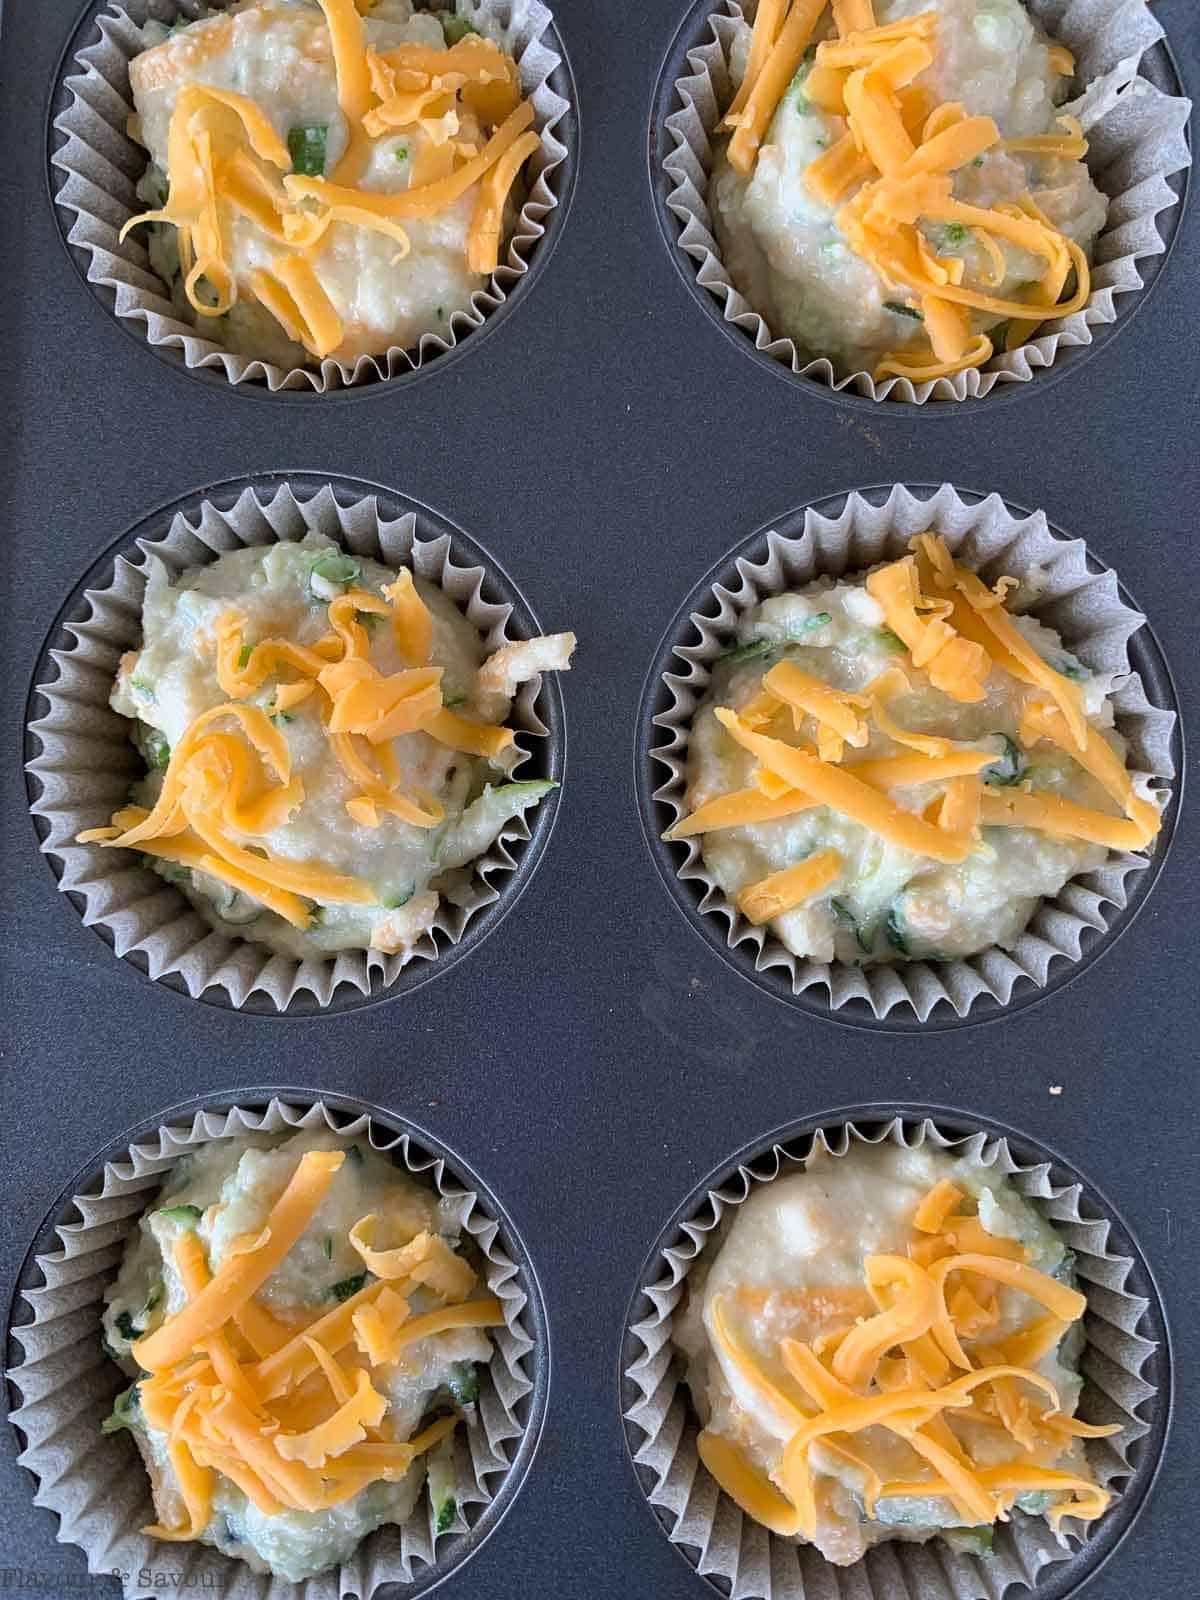 Zucchini Cheddar Muffins ready to bake